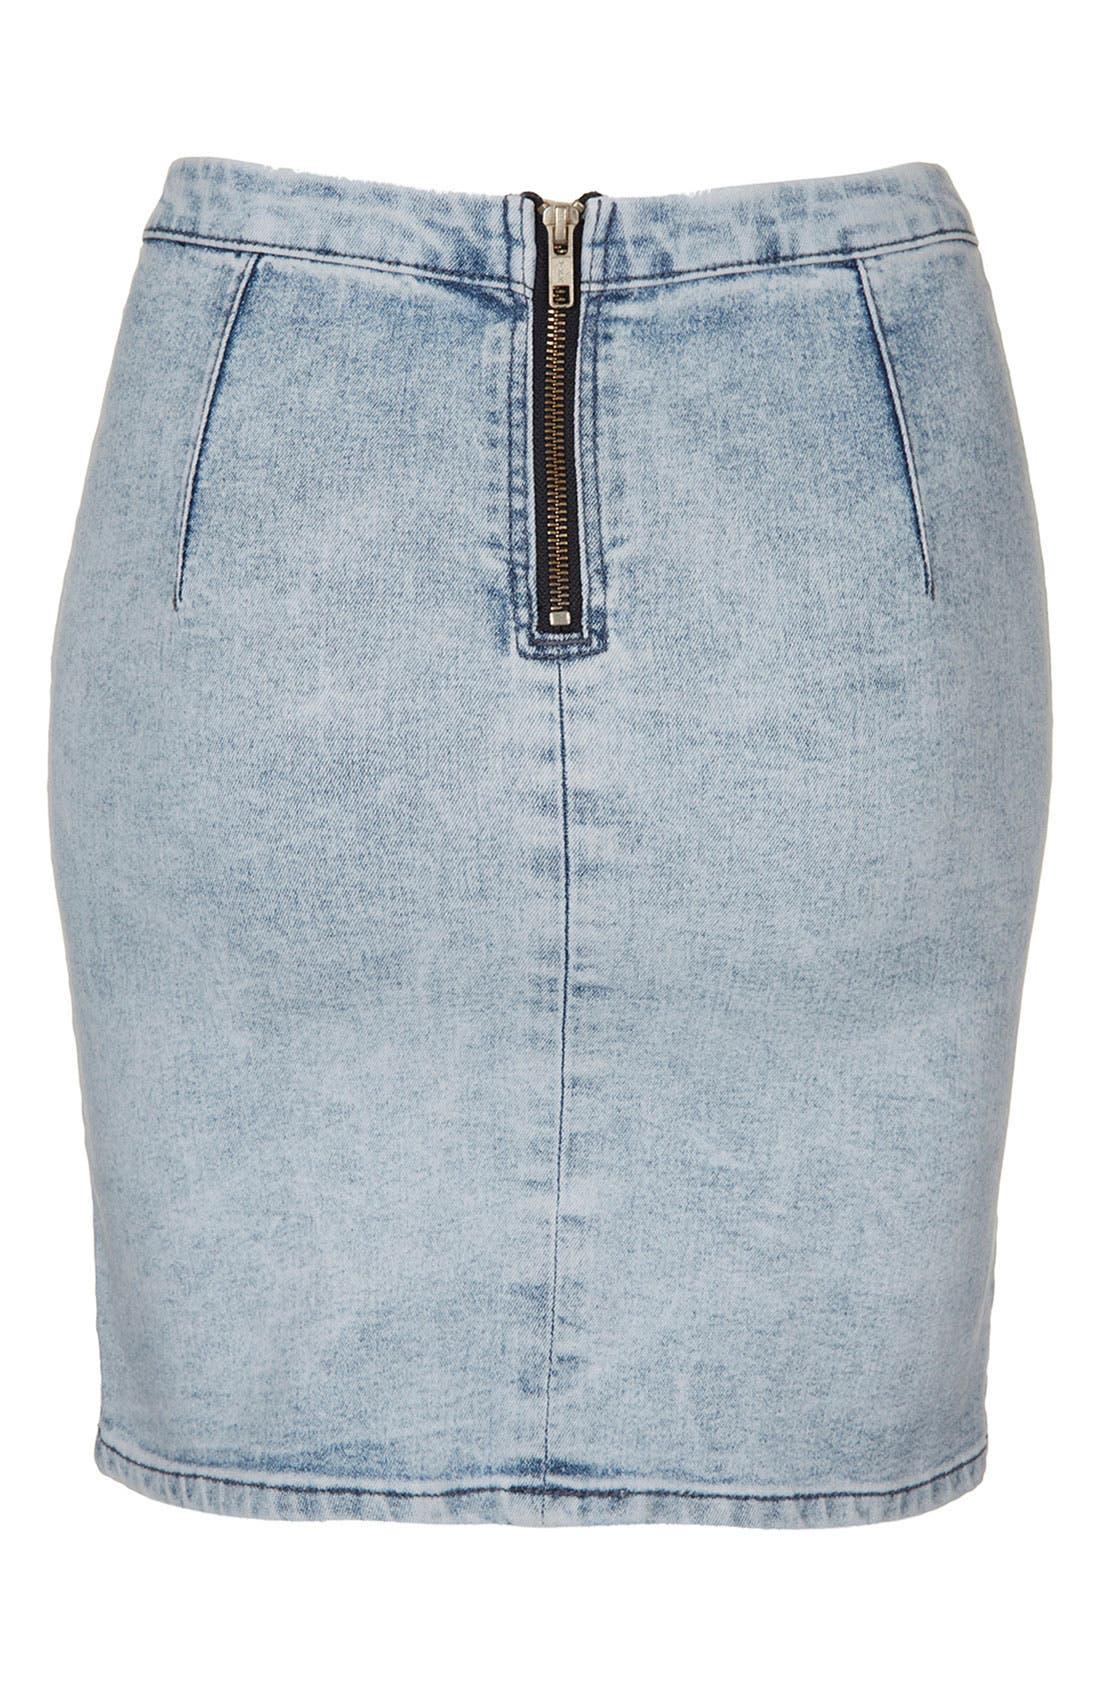 Alternate Image 2  - Topshop Moto 'Joni' Denim Skirt